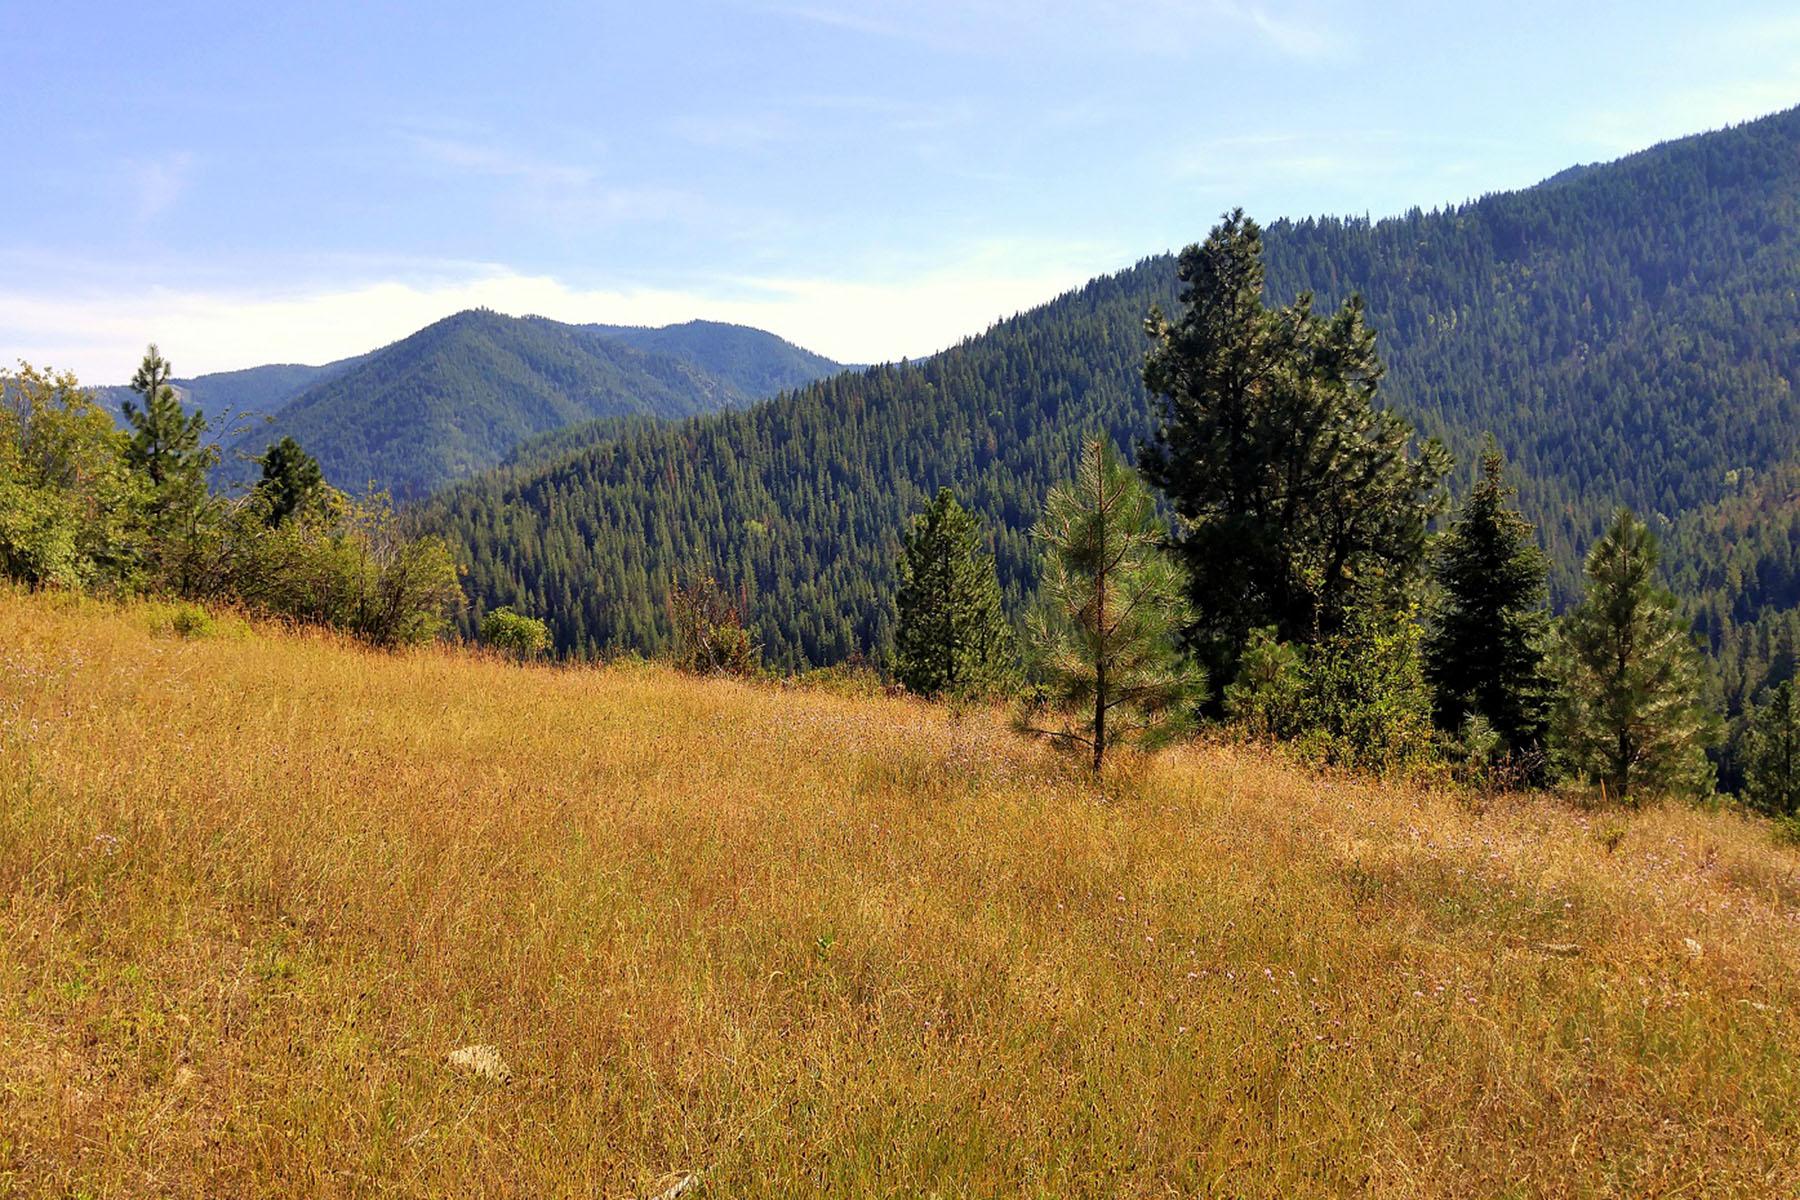 土地 為 出售 在 36.51 acres overlooking the beautiful Notrh Idaho mountains NNA 5 East Fork Pine Creek Rd Pinehurst, 愛達荷州, 83850 美國